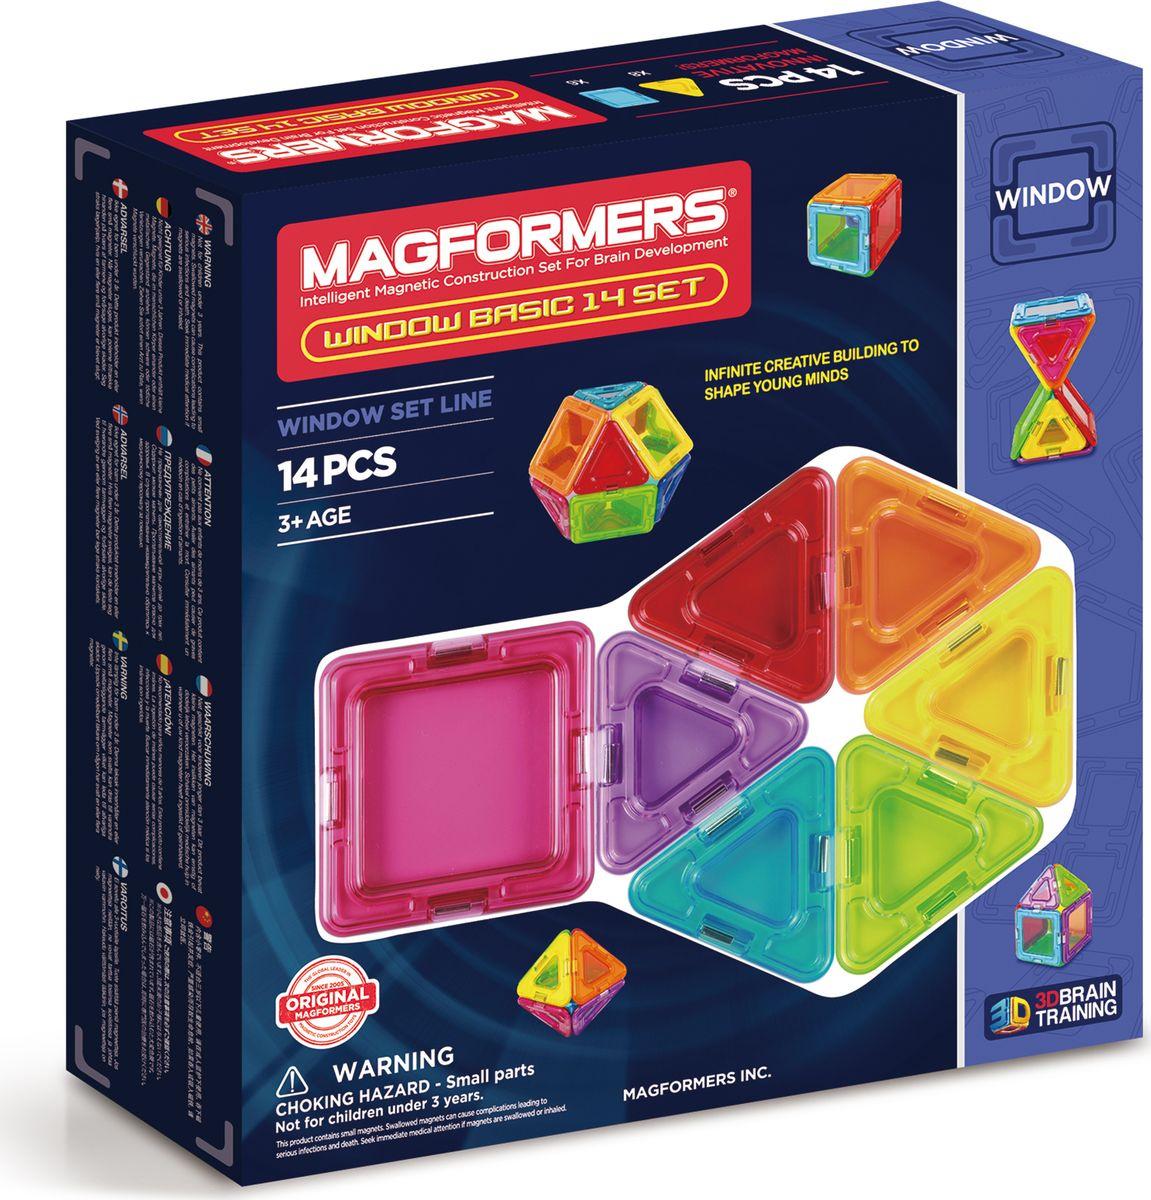 Magformers Магнитный конструктор Window Basic 14 Set #1